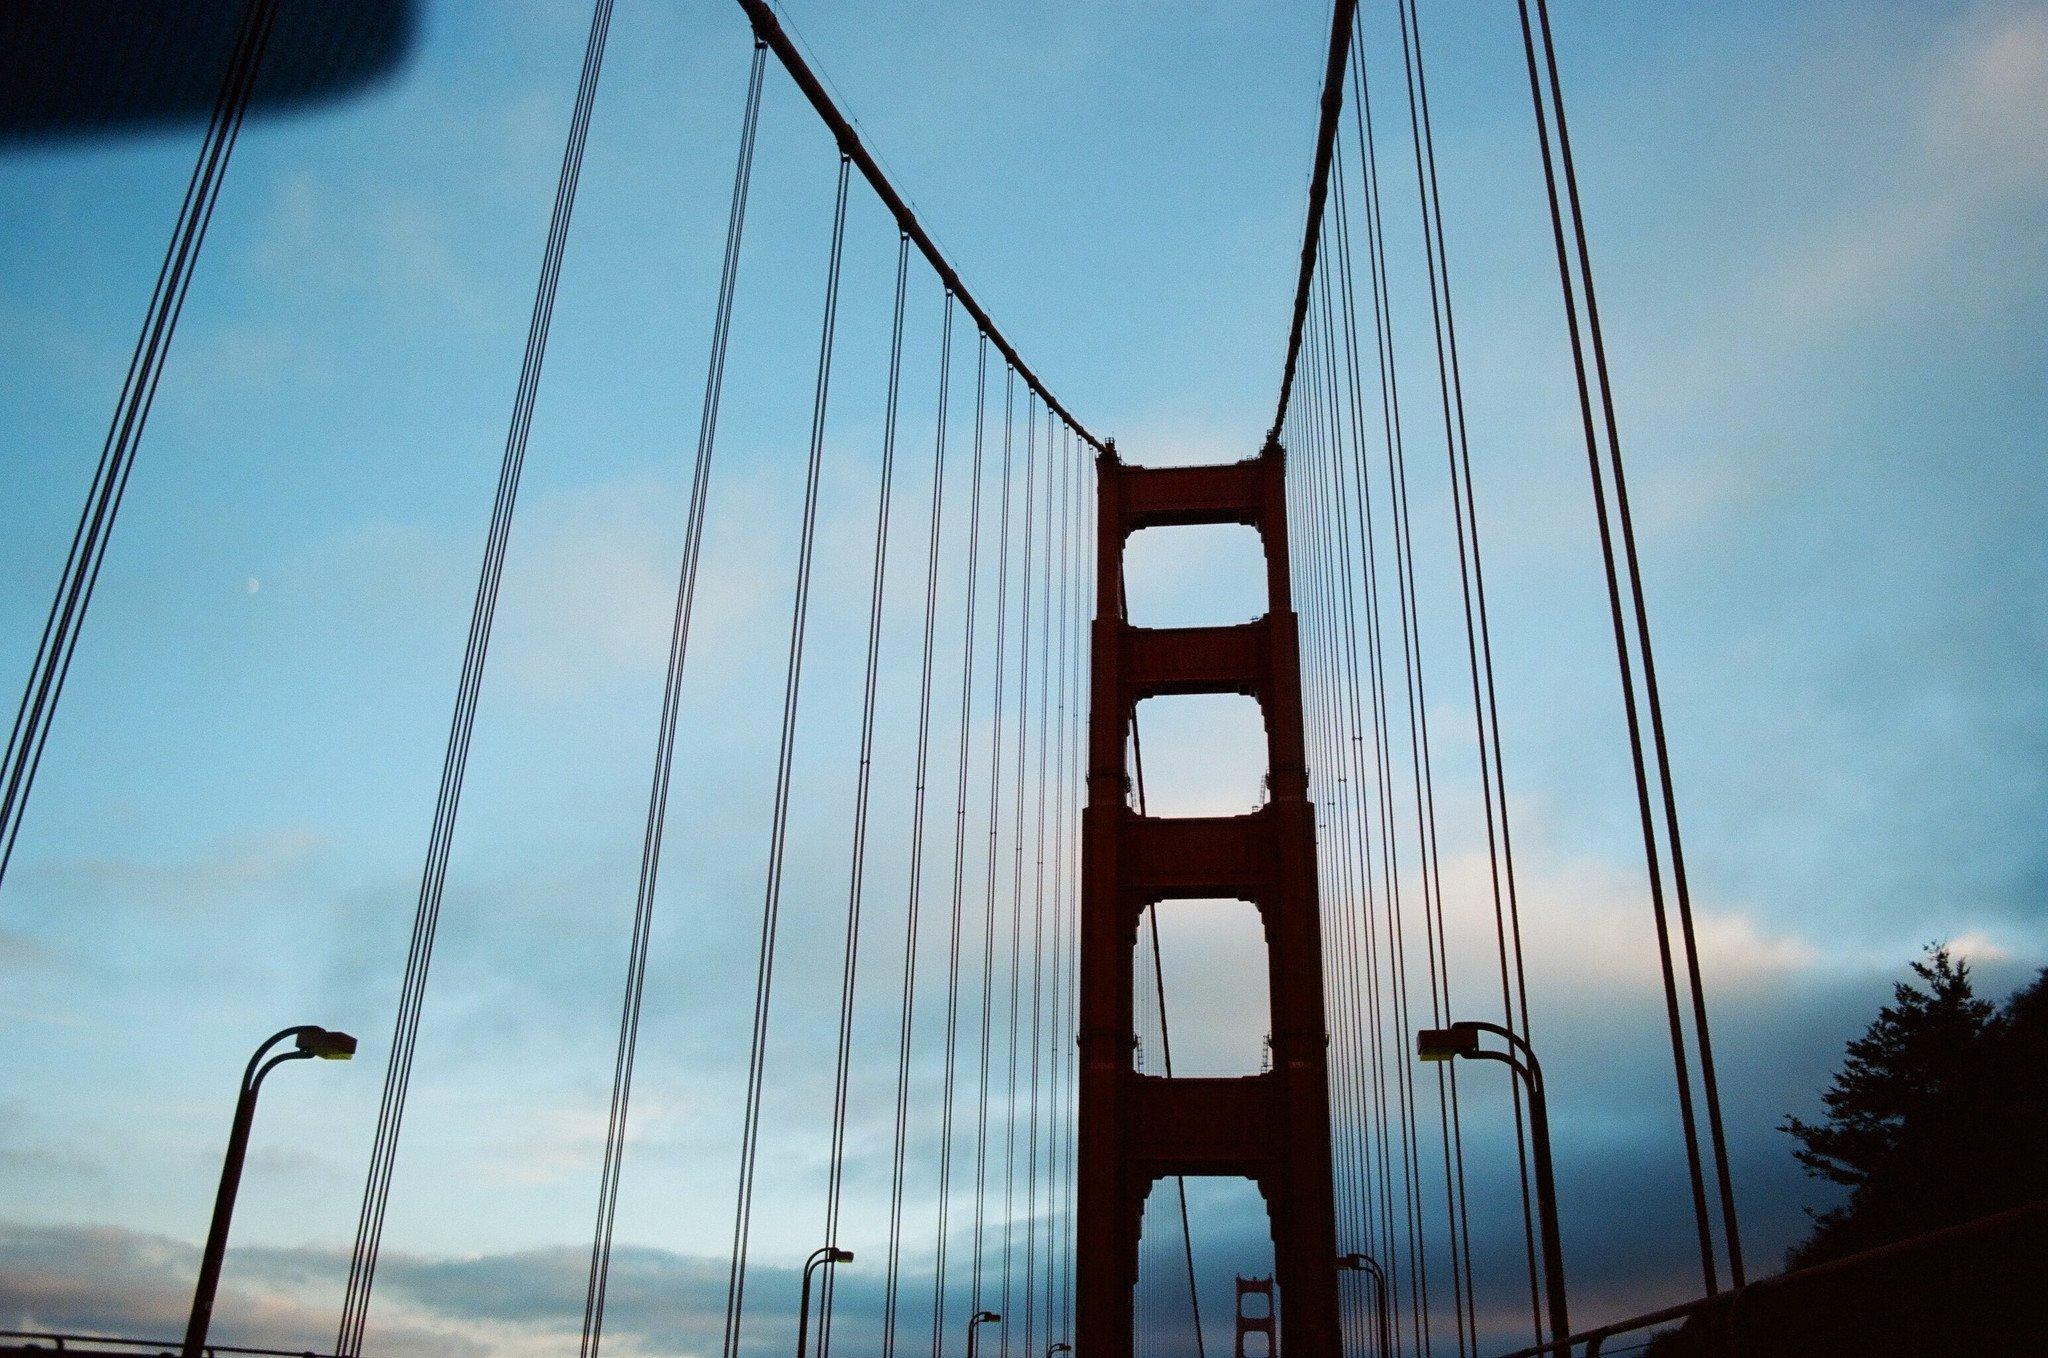 Golden Gate Bridge views in San Francisco, California